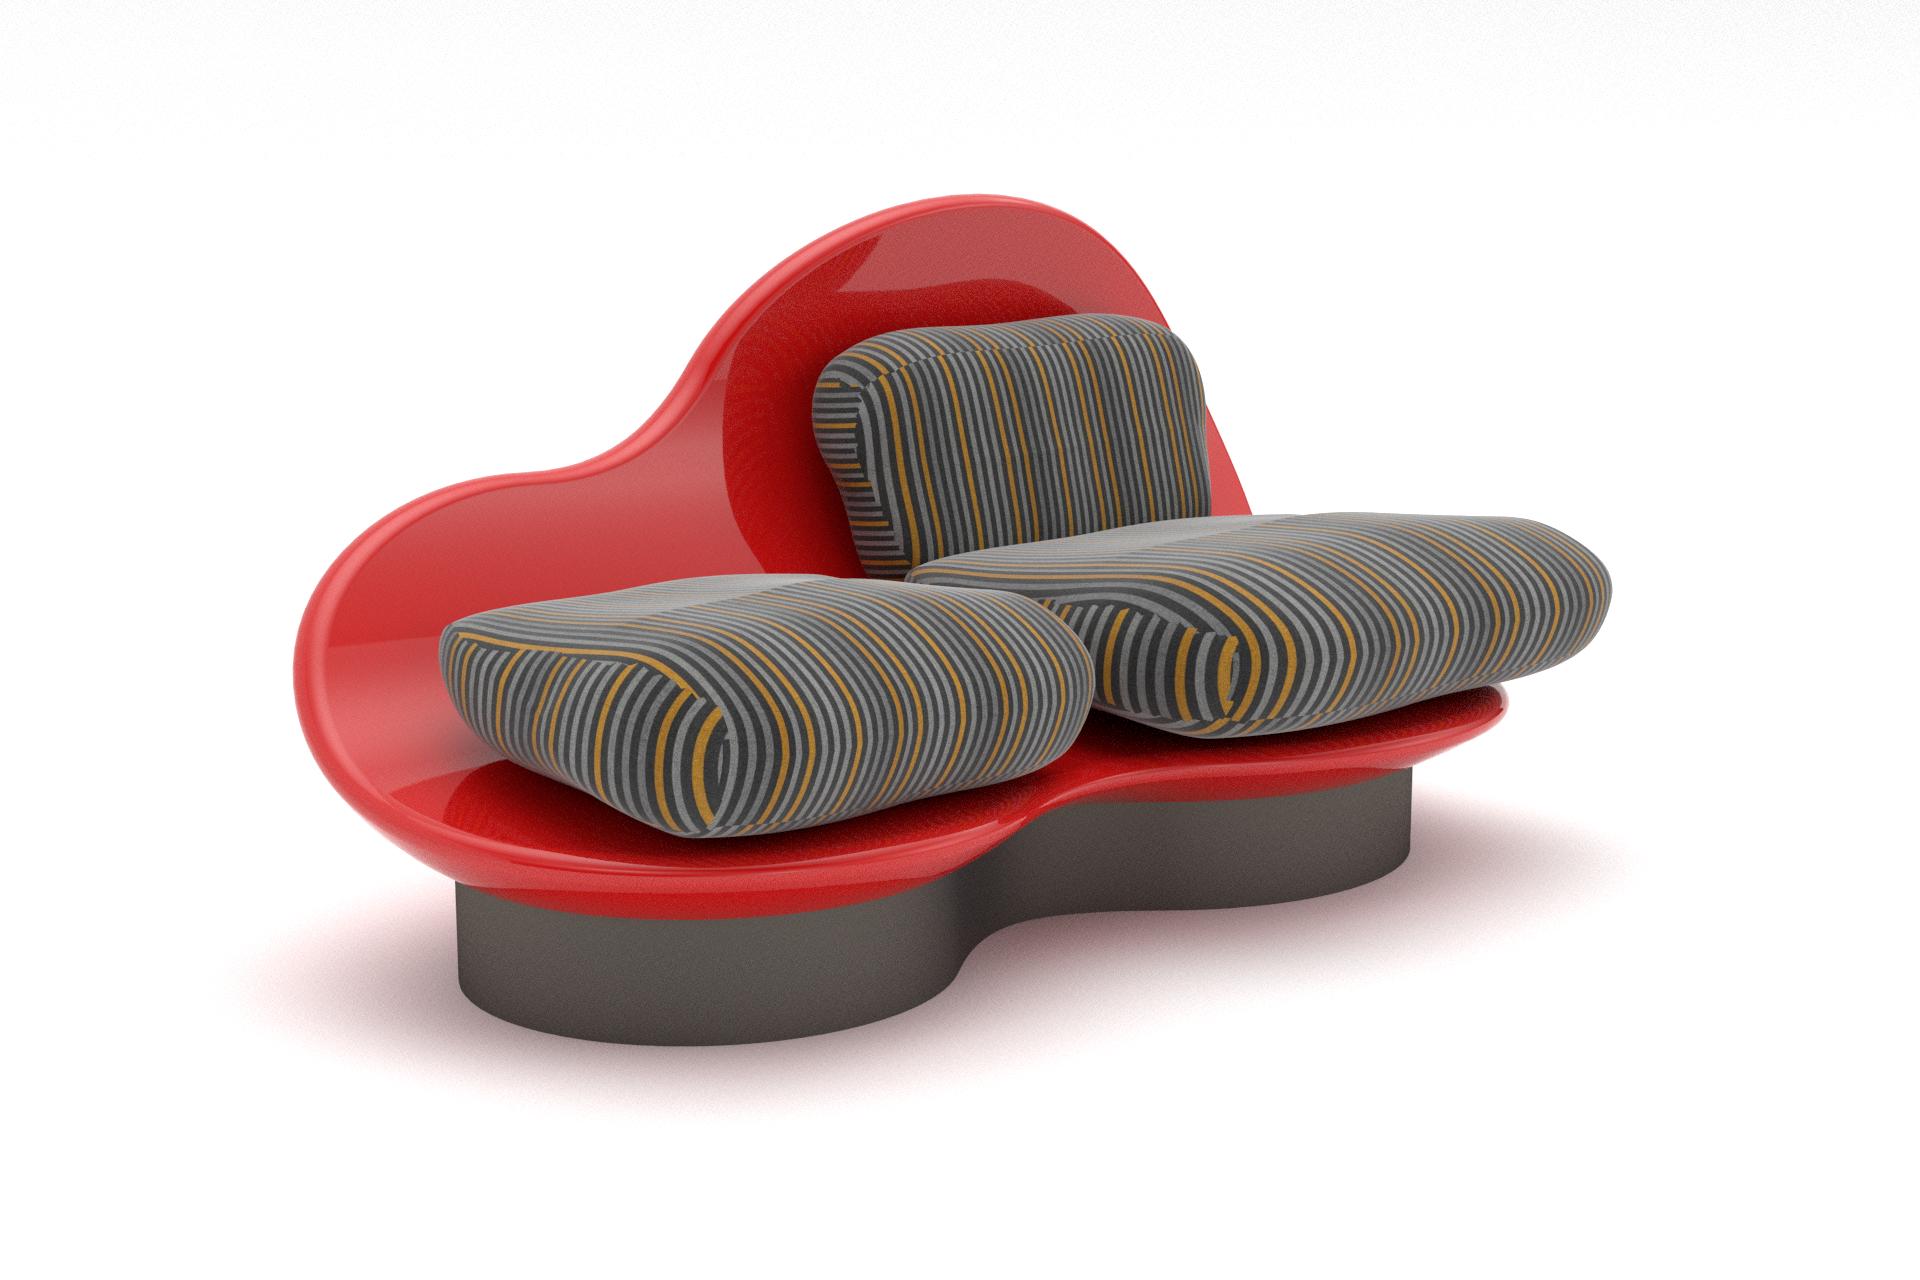 Sidechair_imm_01